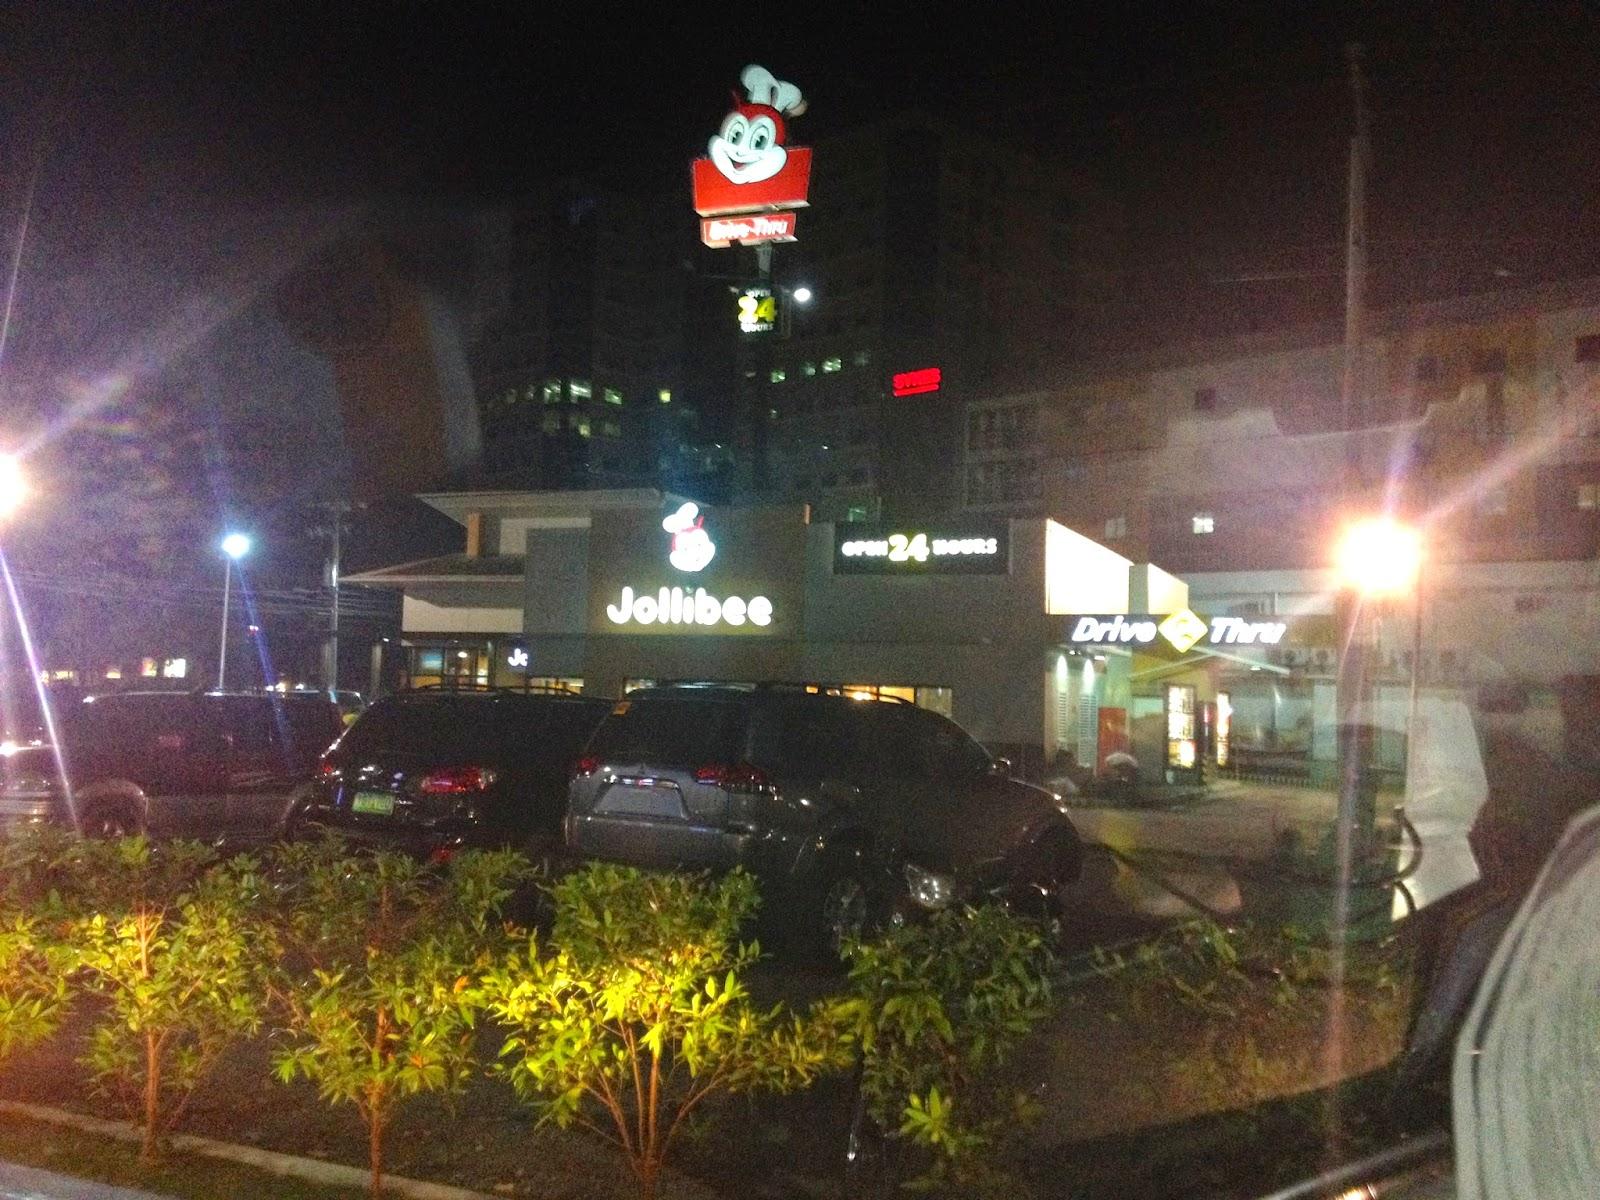 Jollibee F. Cabahug Cebu City